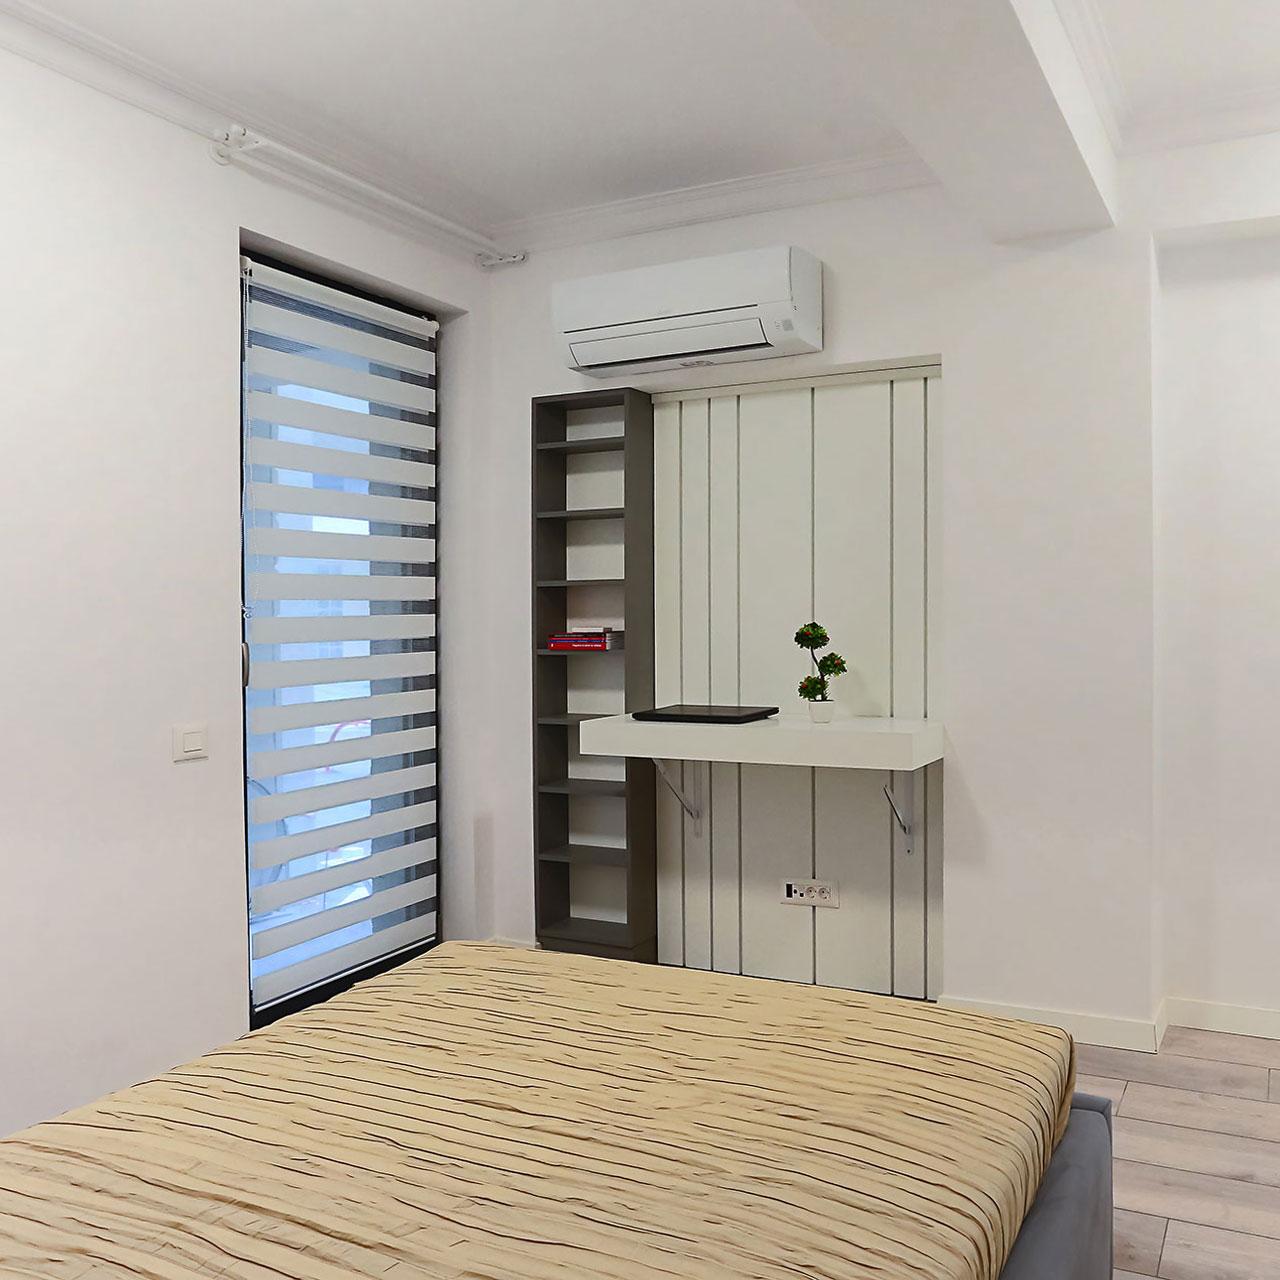 Apartamente de vanzare Bucuresti - Catedral Residence - Marriott, Piata Unirii, 13 Septembrie, Izvor - G2 - 7